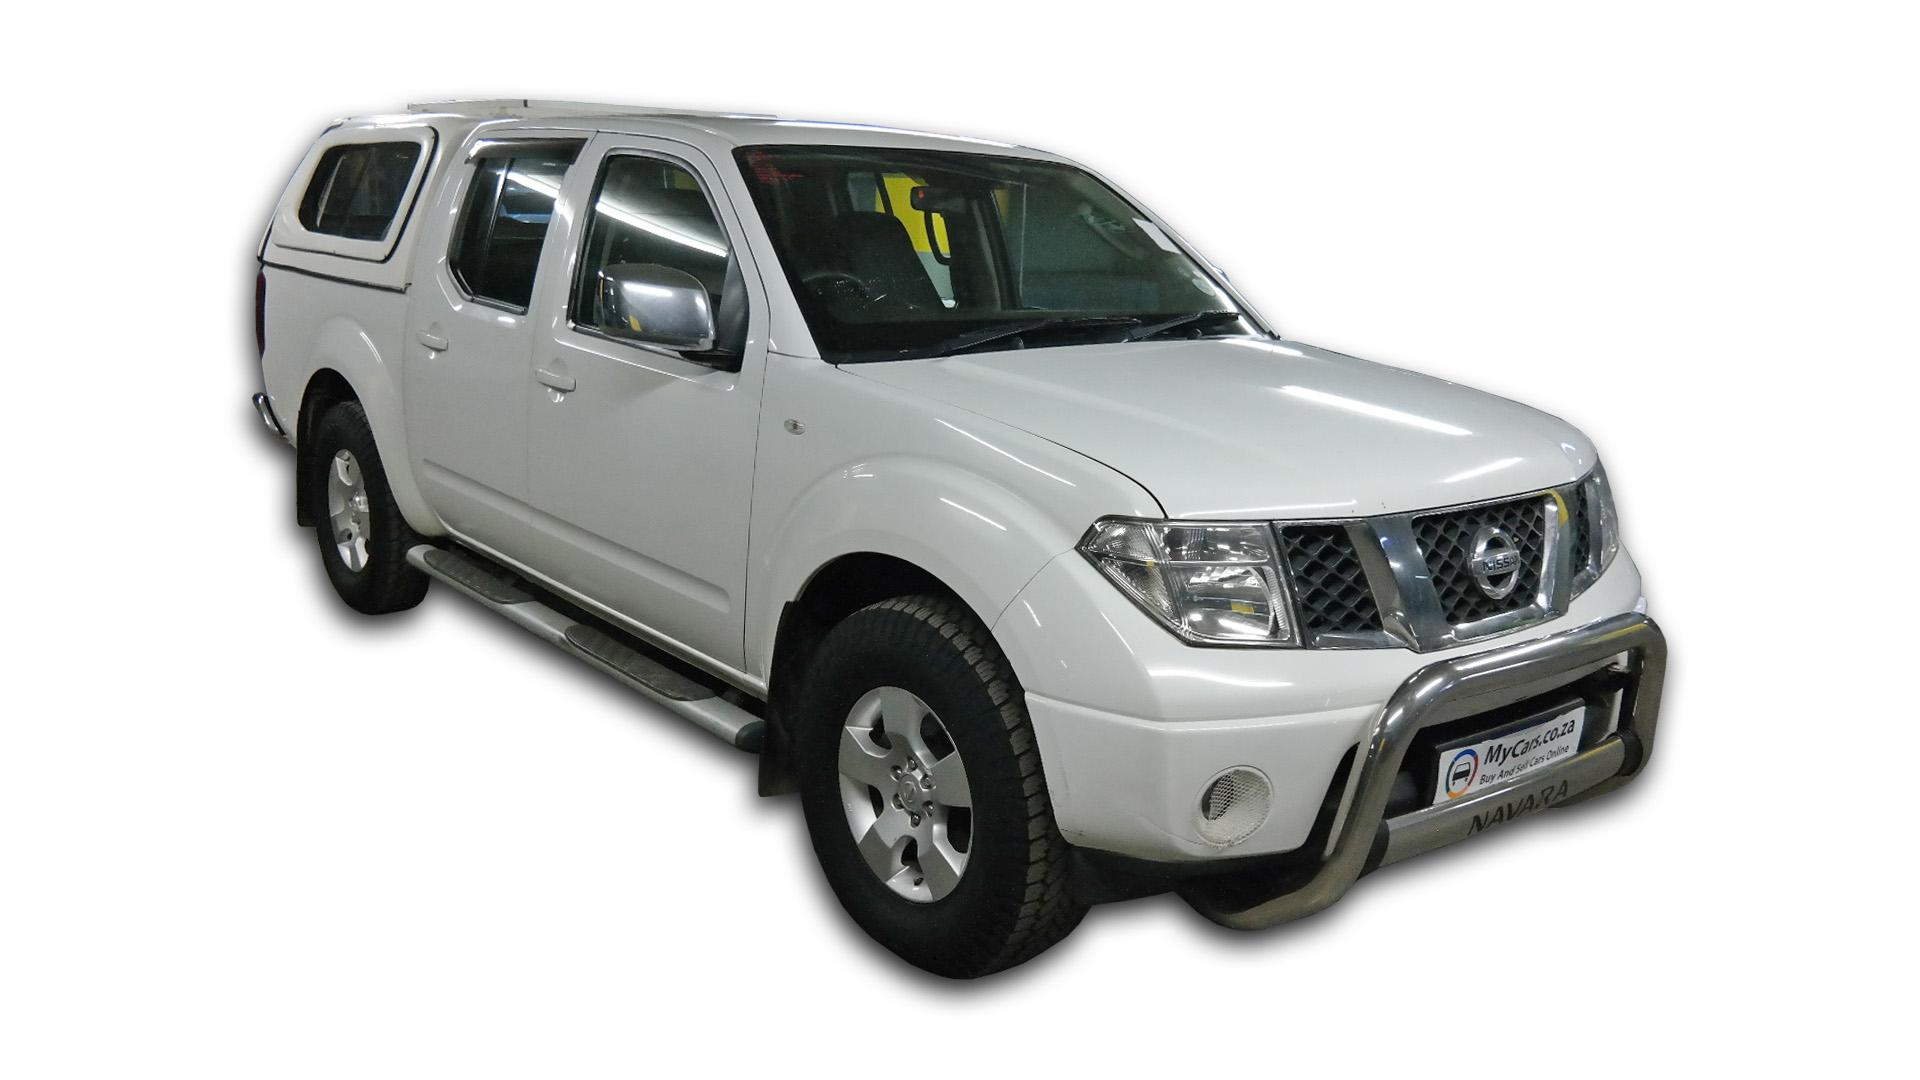 Nissan Navara 2.5 Dci XE